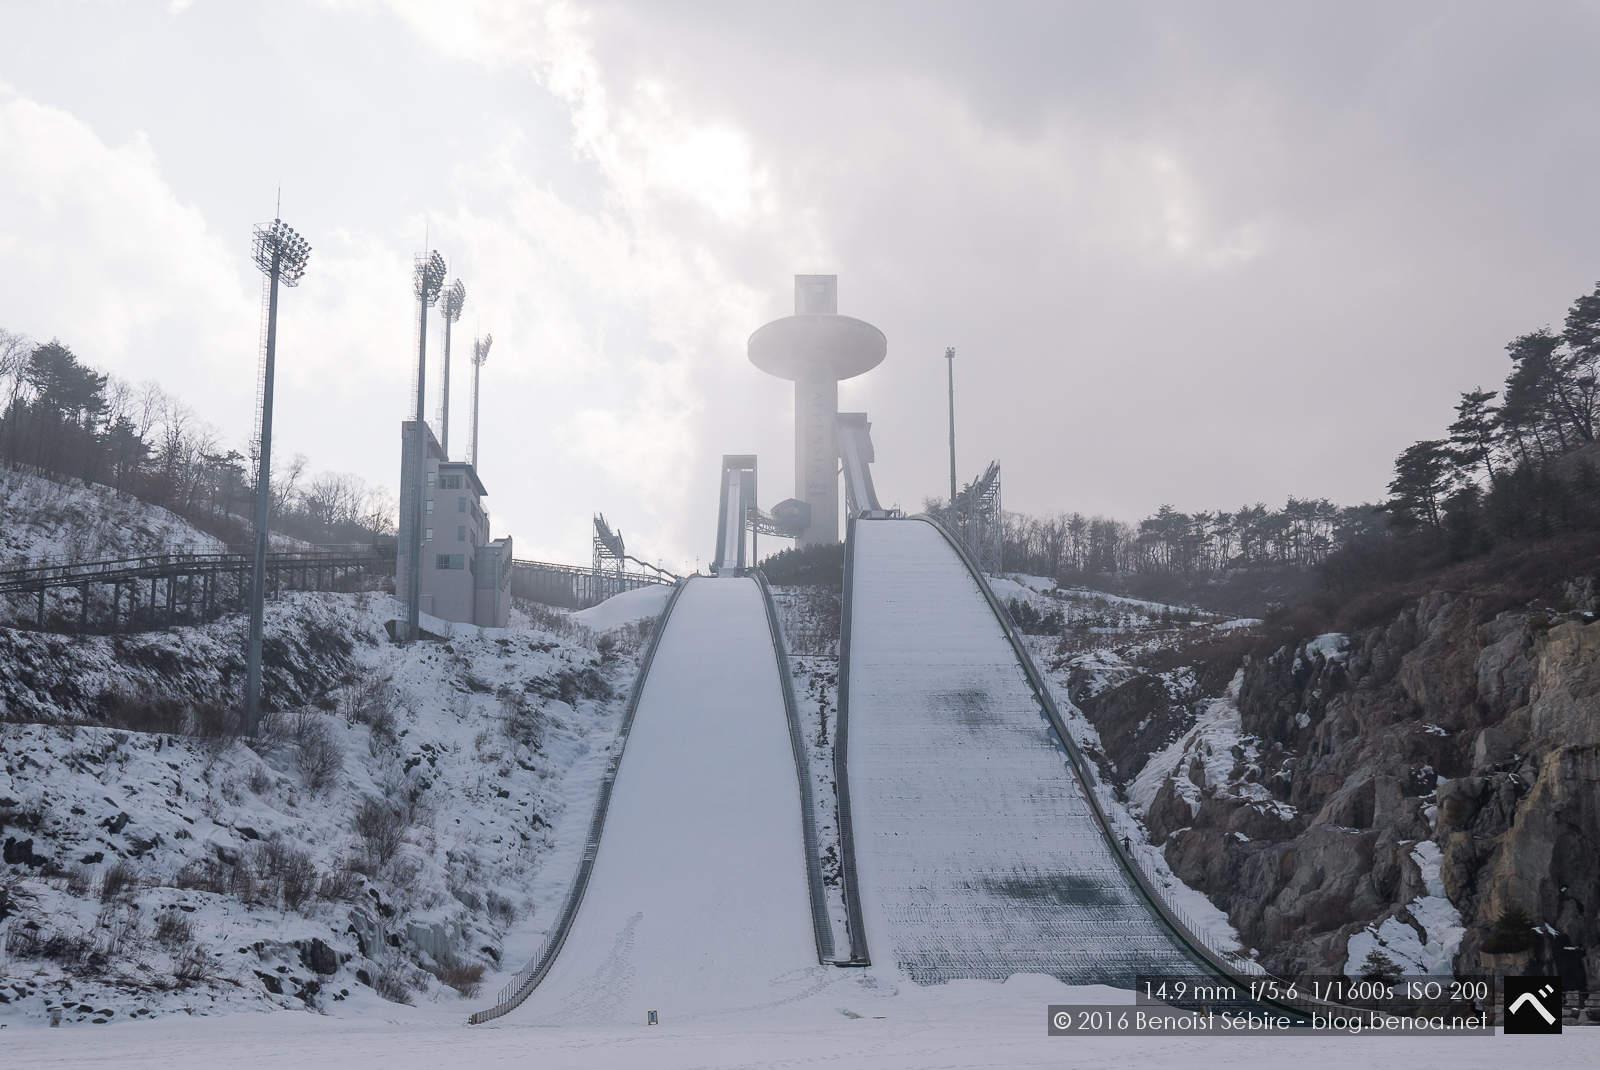 Pyeongchang Ski Jump